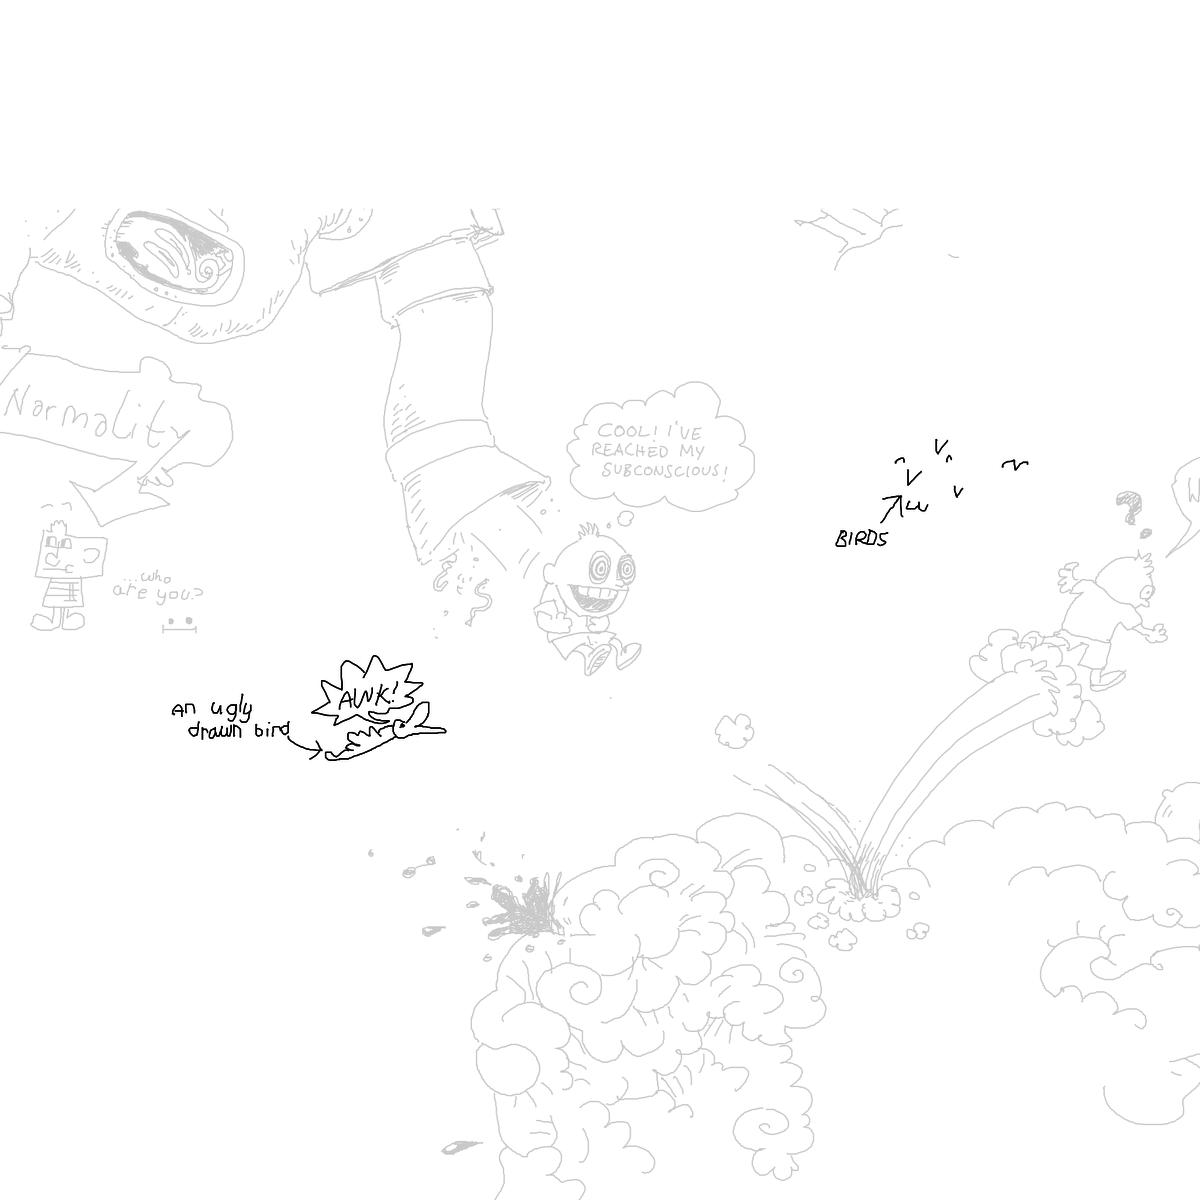 BAAAM drawing#24131 lat:78.4192199707031200lng: -4.4738717079162600